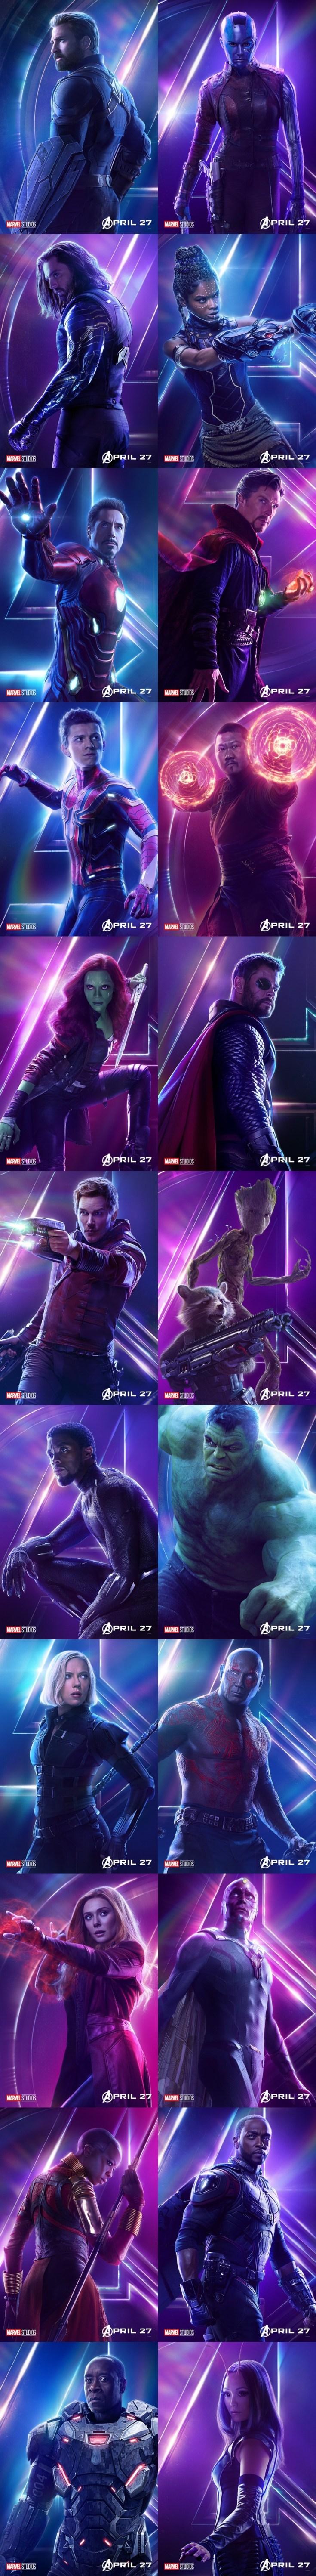 avengers, avengers infinity war, captain america, captain america's butt, cap's butt, cap's butt pose, new posters, marvel, mcu, depepi, depepi.com